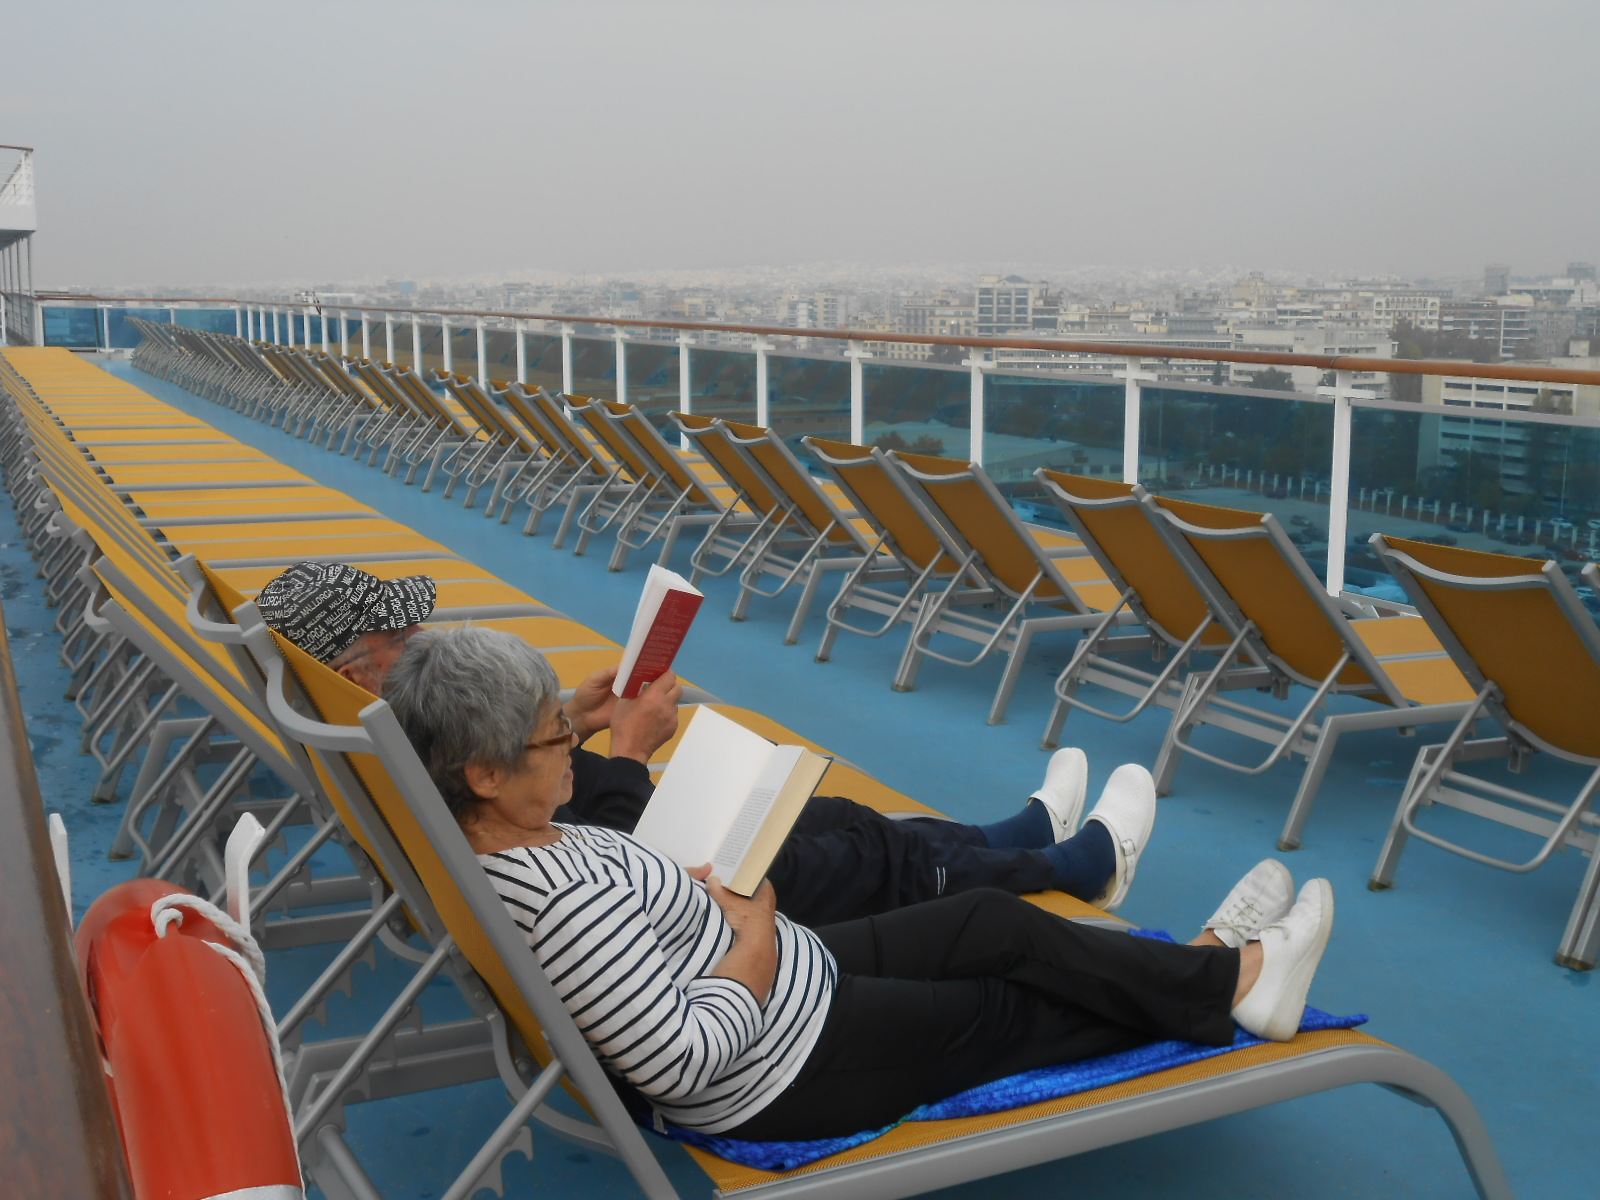 DSCN9909 Tourists reading